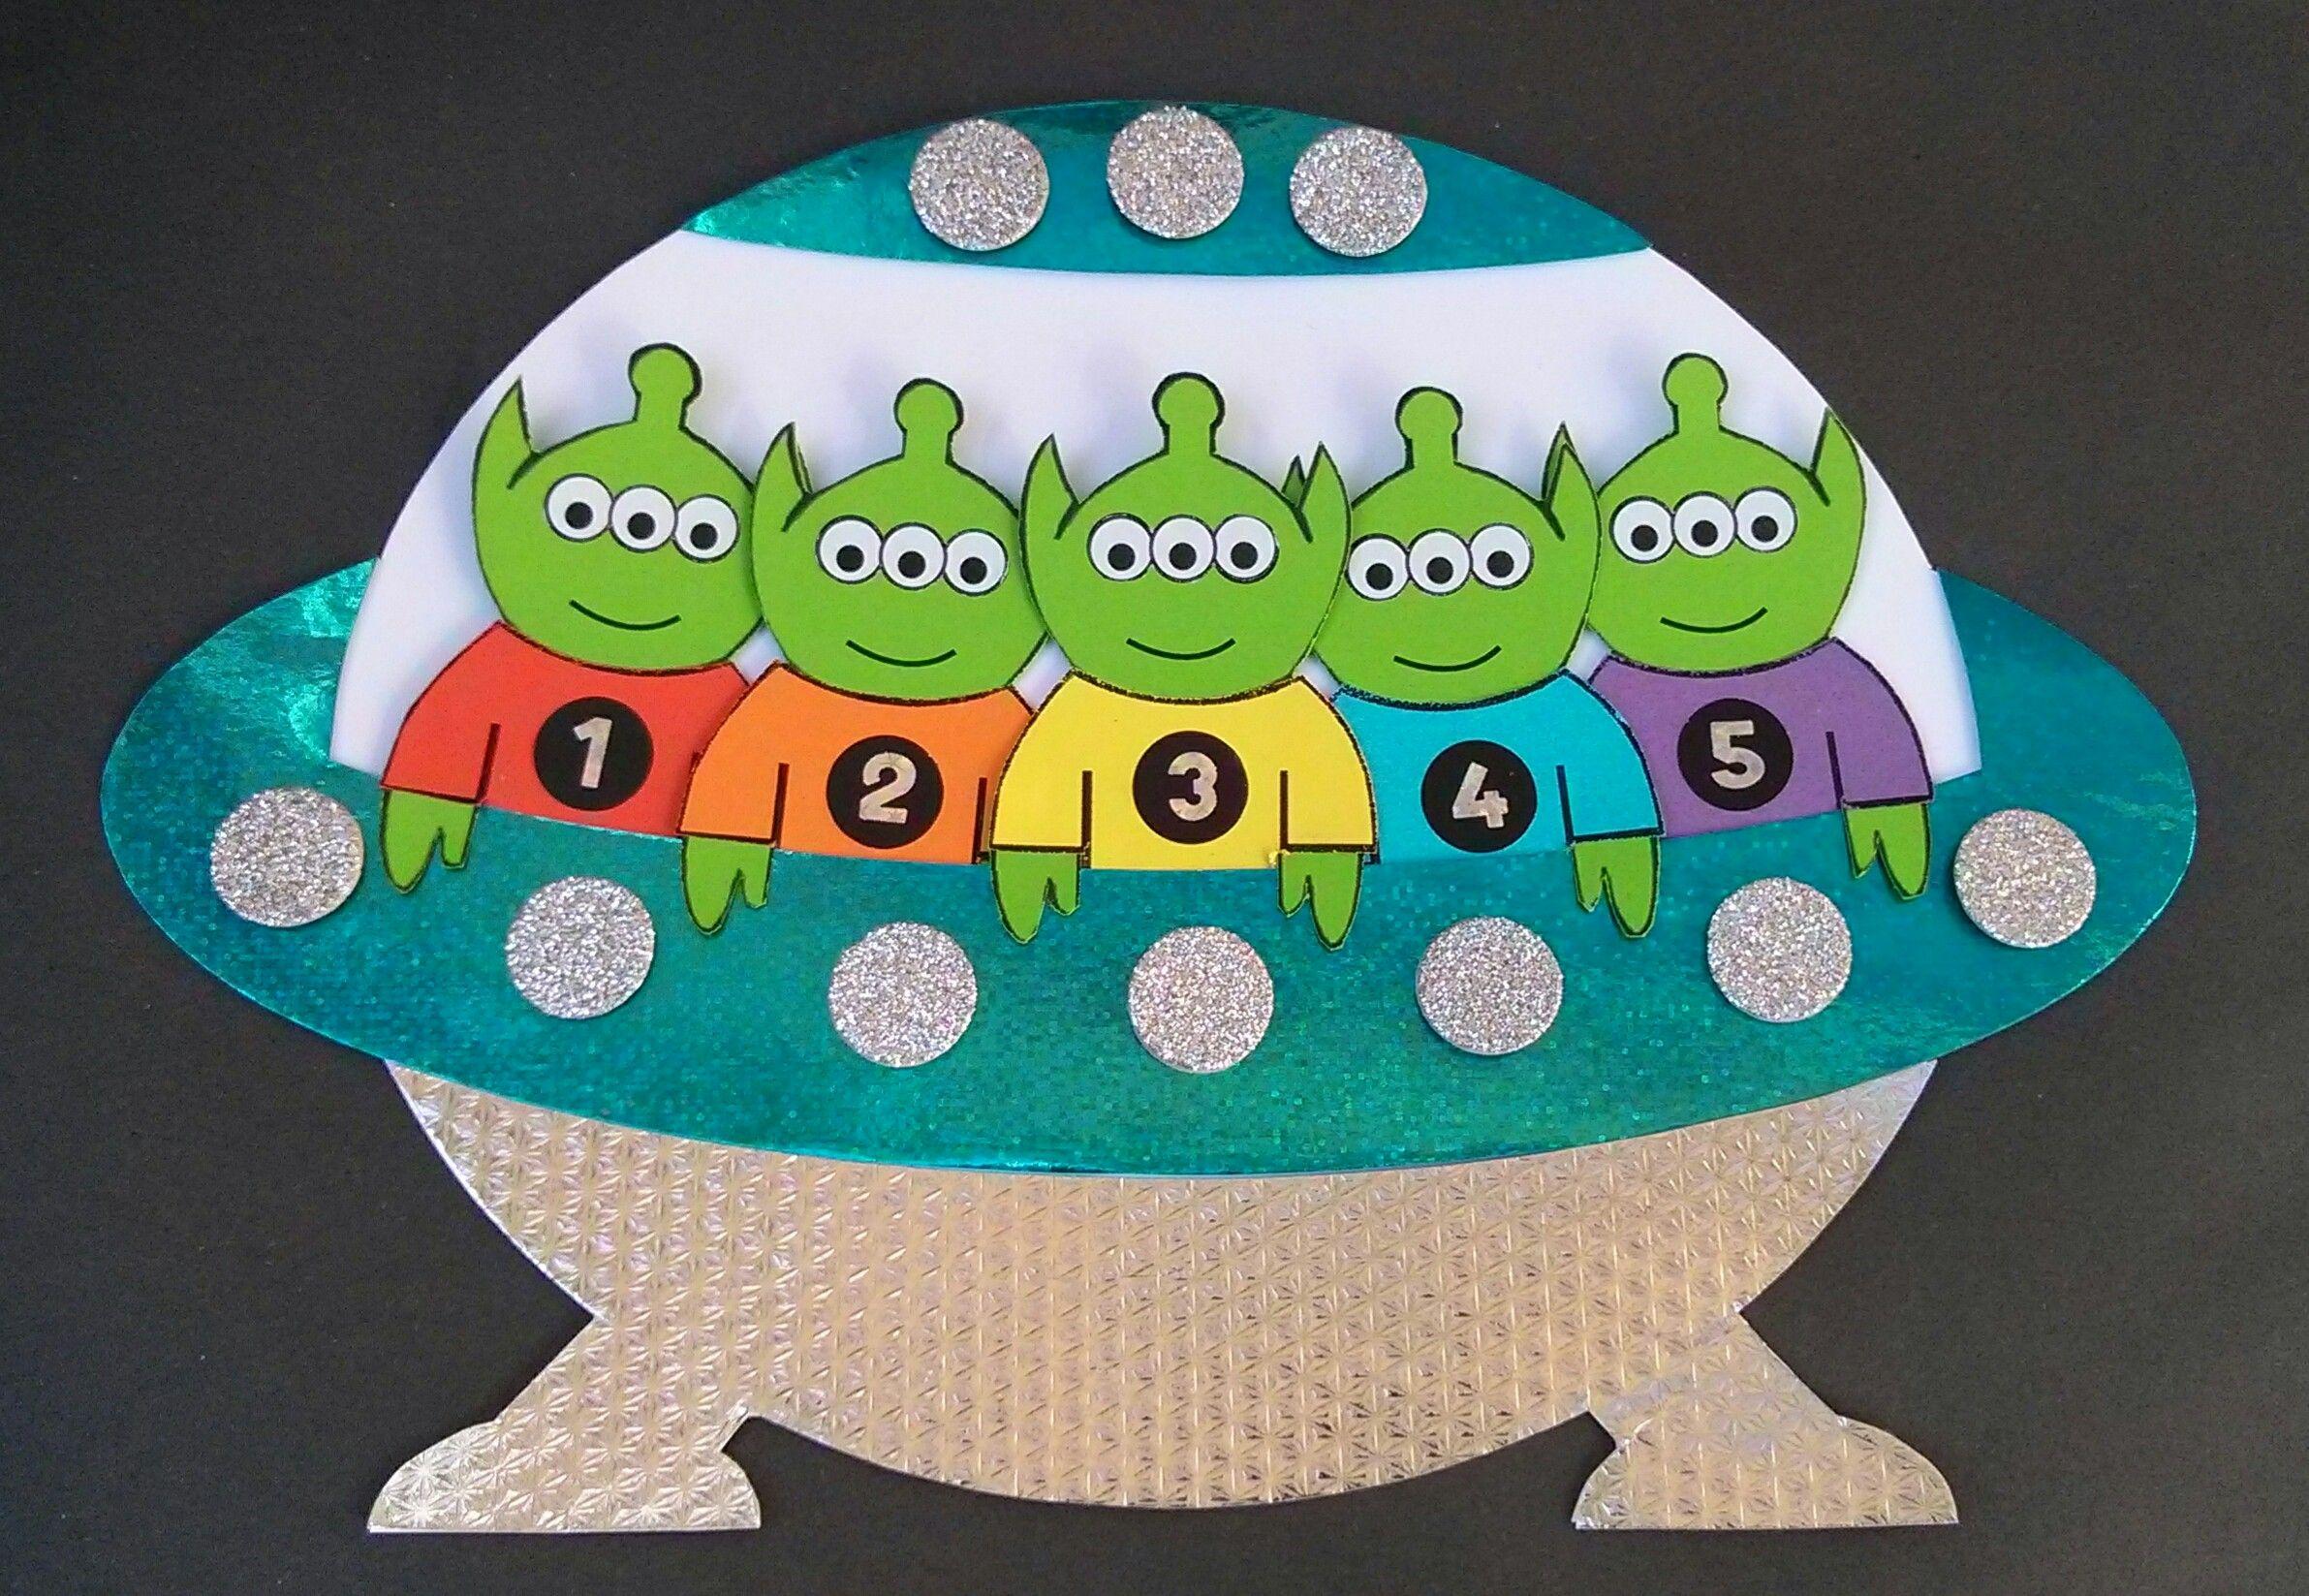 5 Little Men In A Flying Saucer